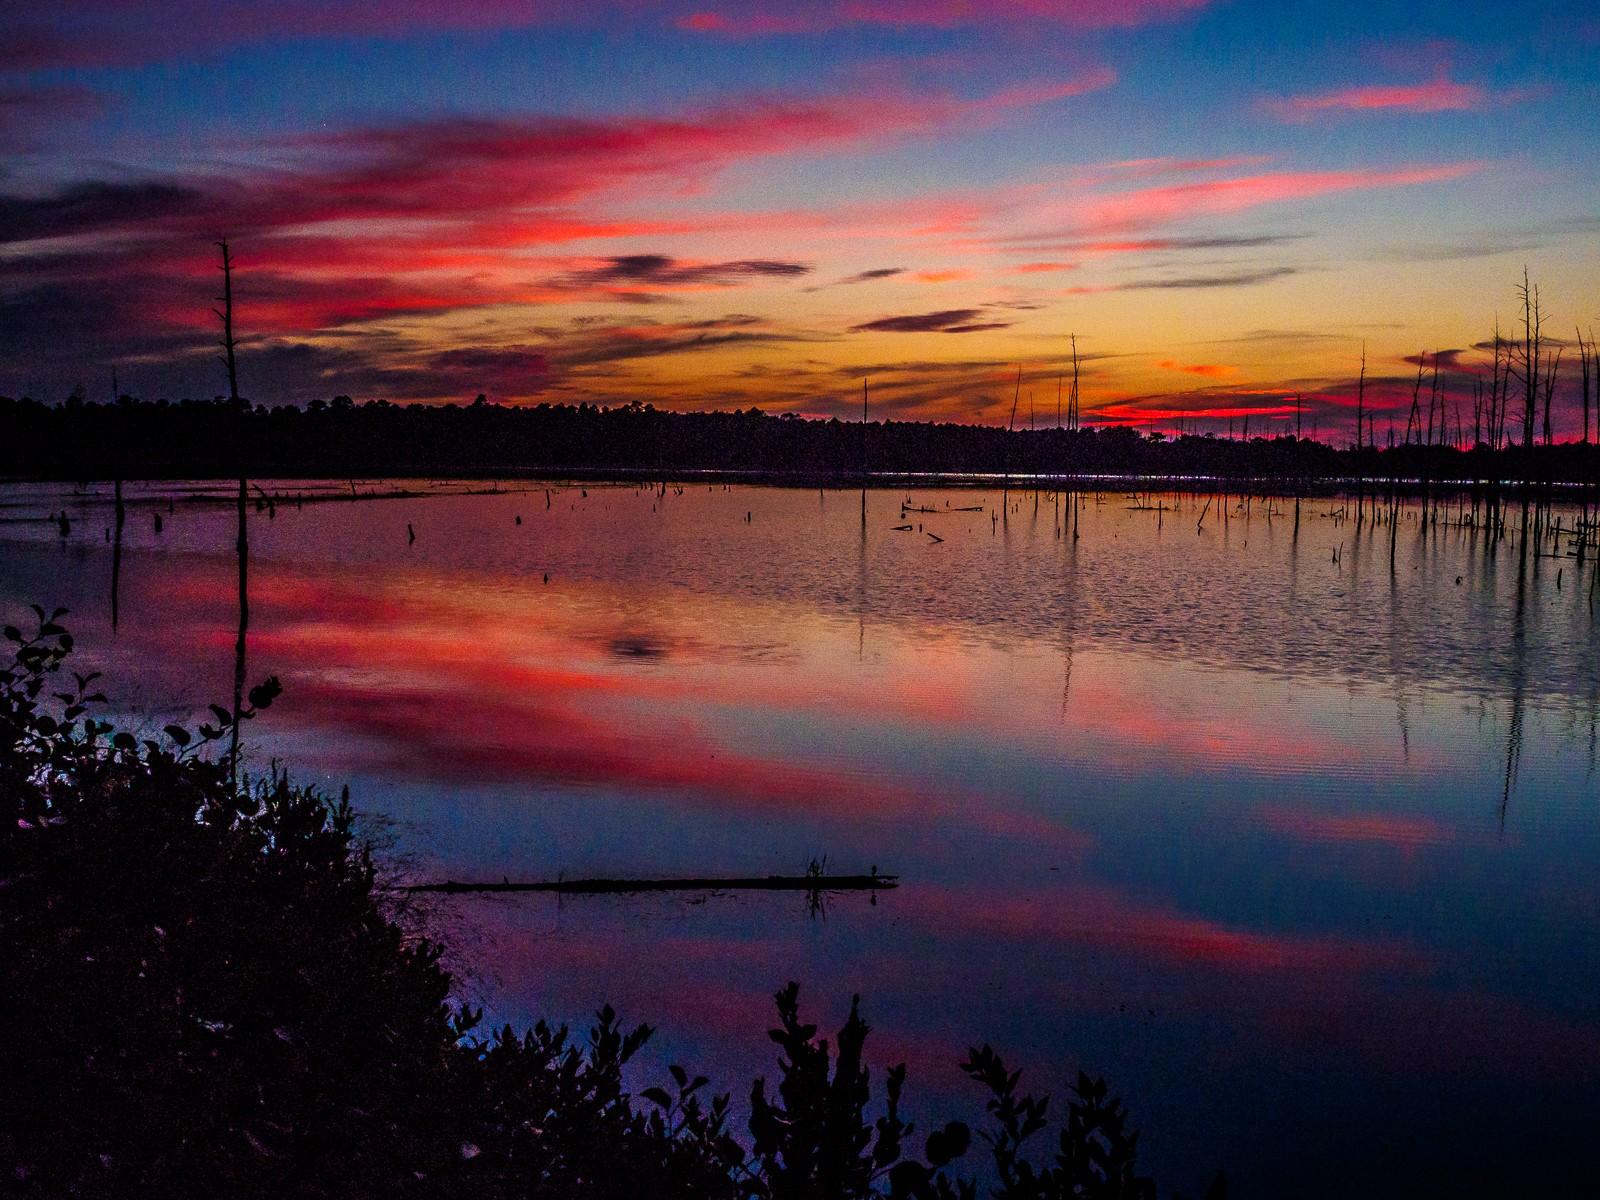 sunset-6643